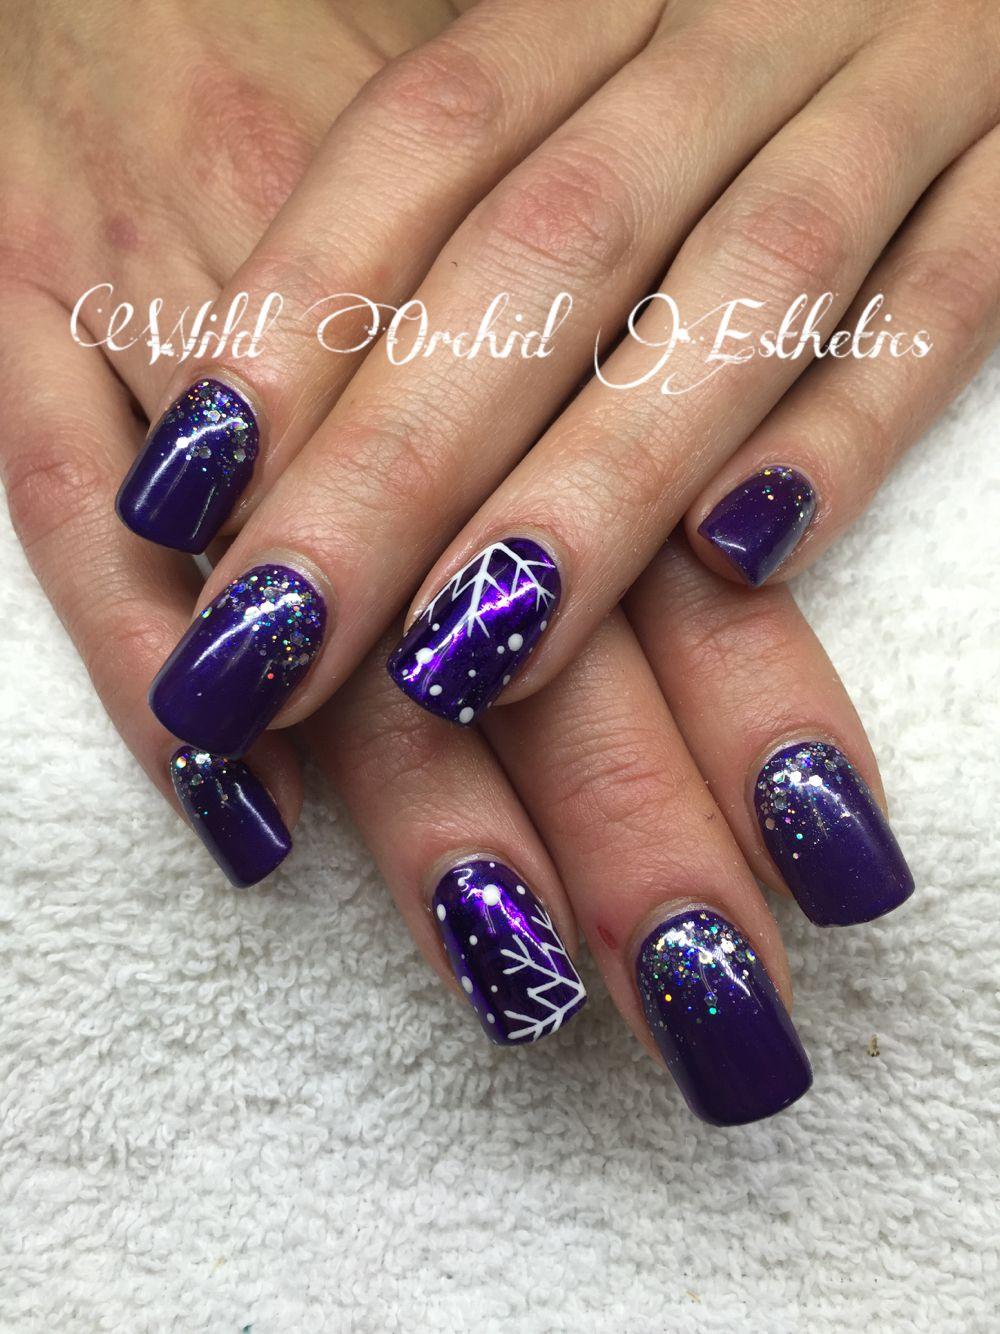 Purple Gel Nails Designs : purple, nails, designs, Purple, Nails., Glitter., Christmas, Snowflake, Nails,, Nails